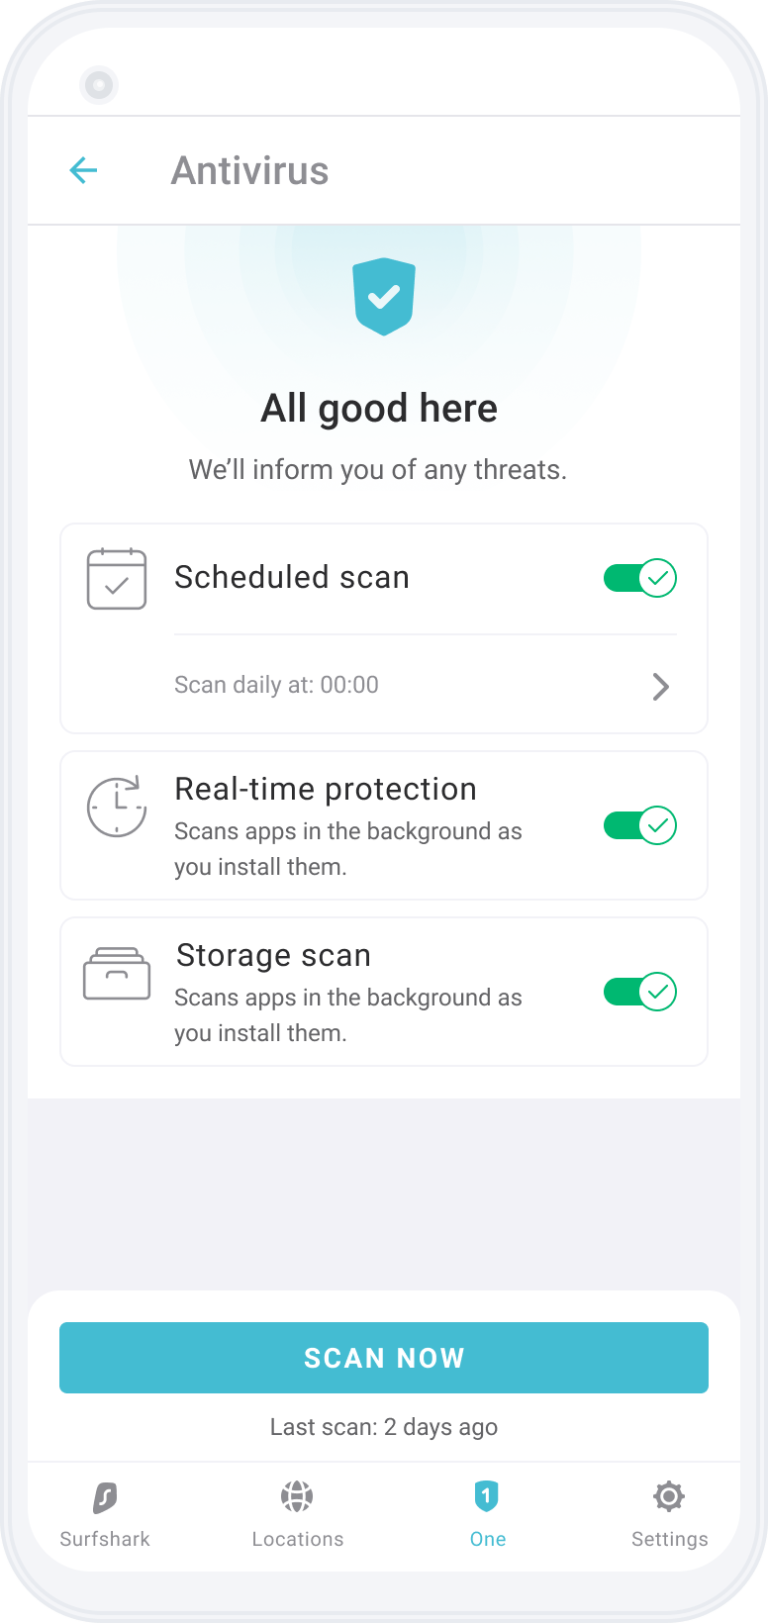 Surfshark Antivirus on your Android